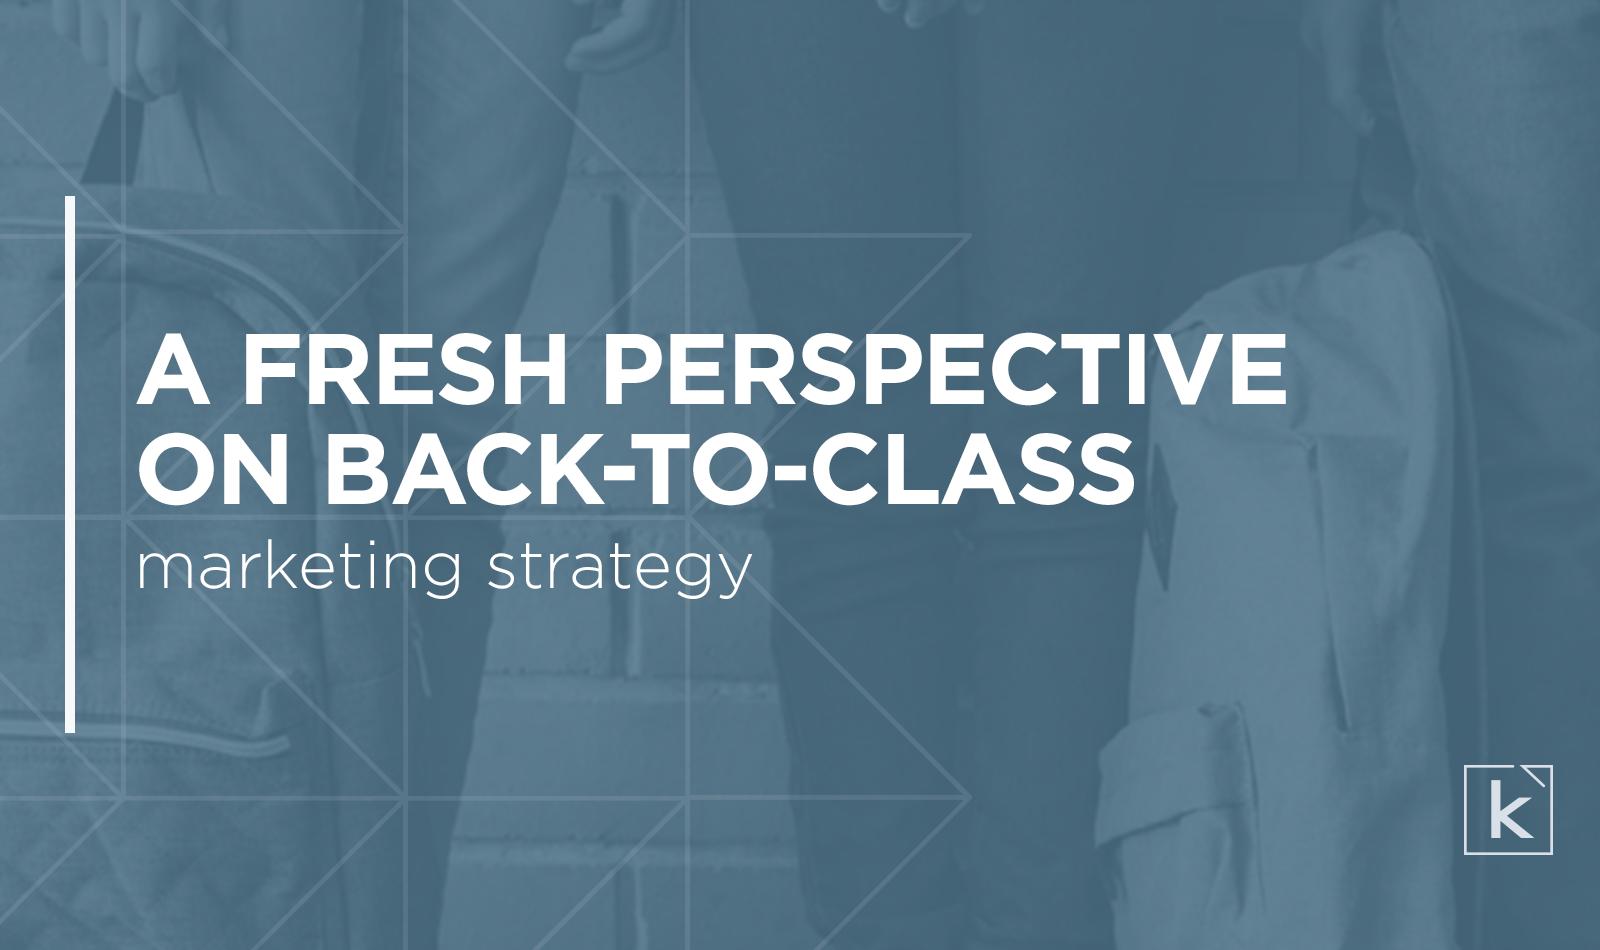 back-to-class-marketing-strategy-kids-backpacks